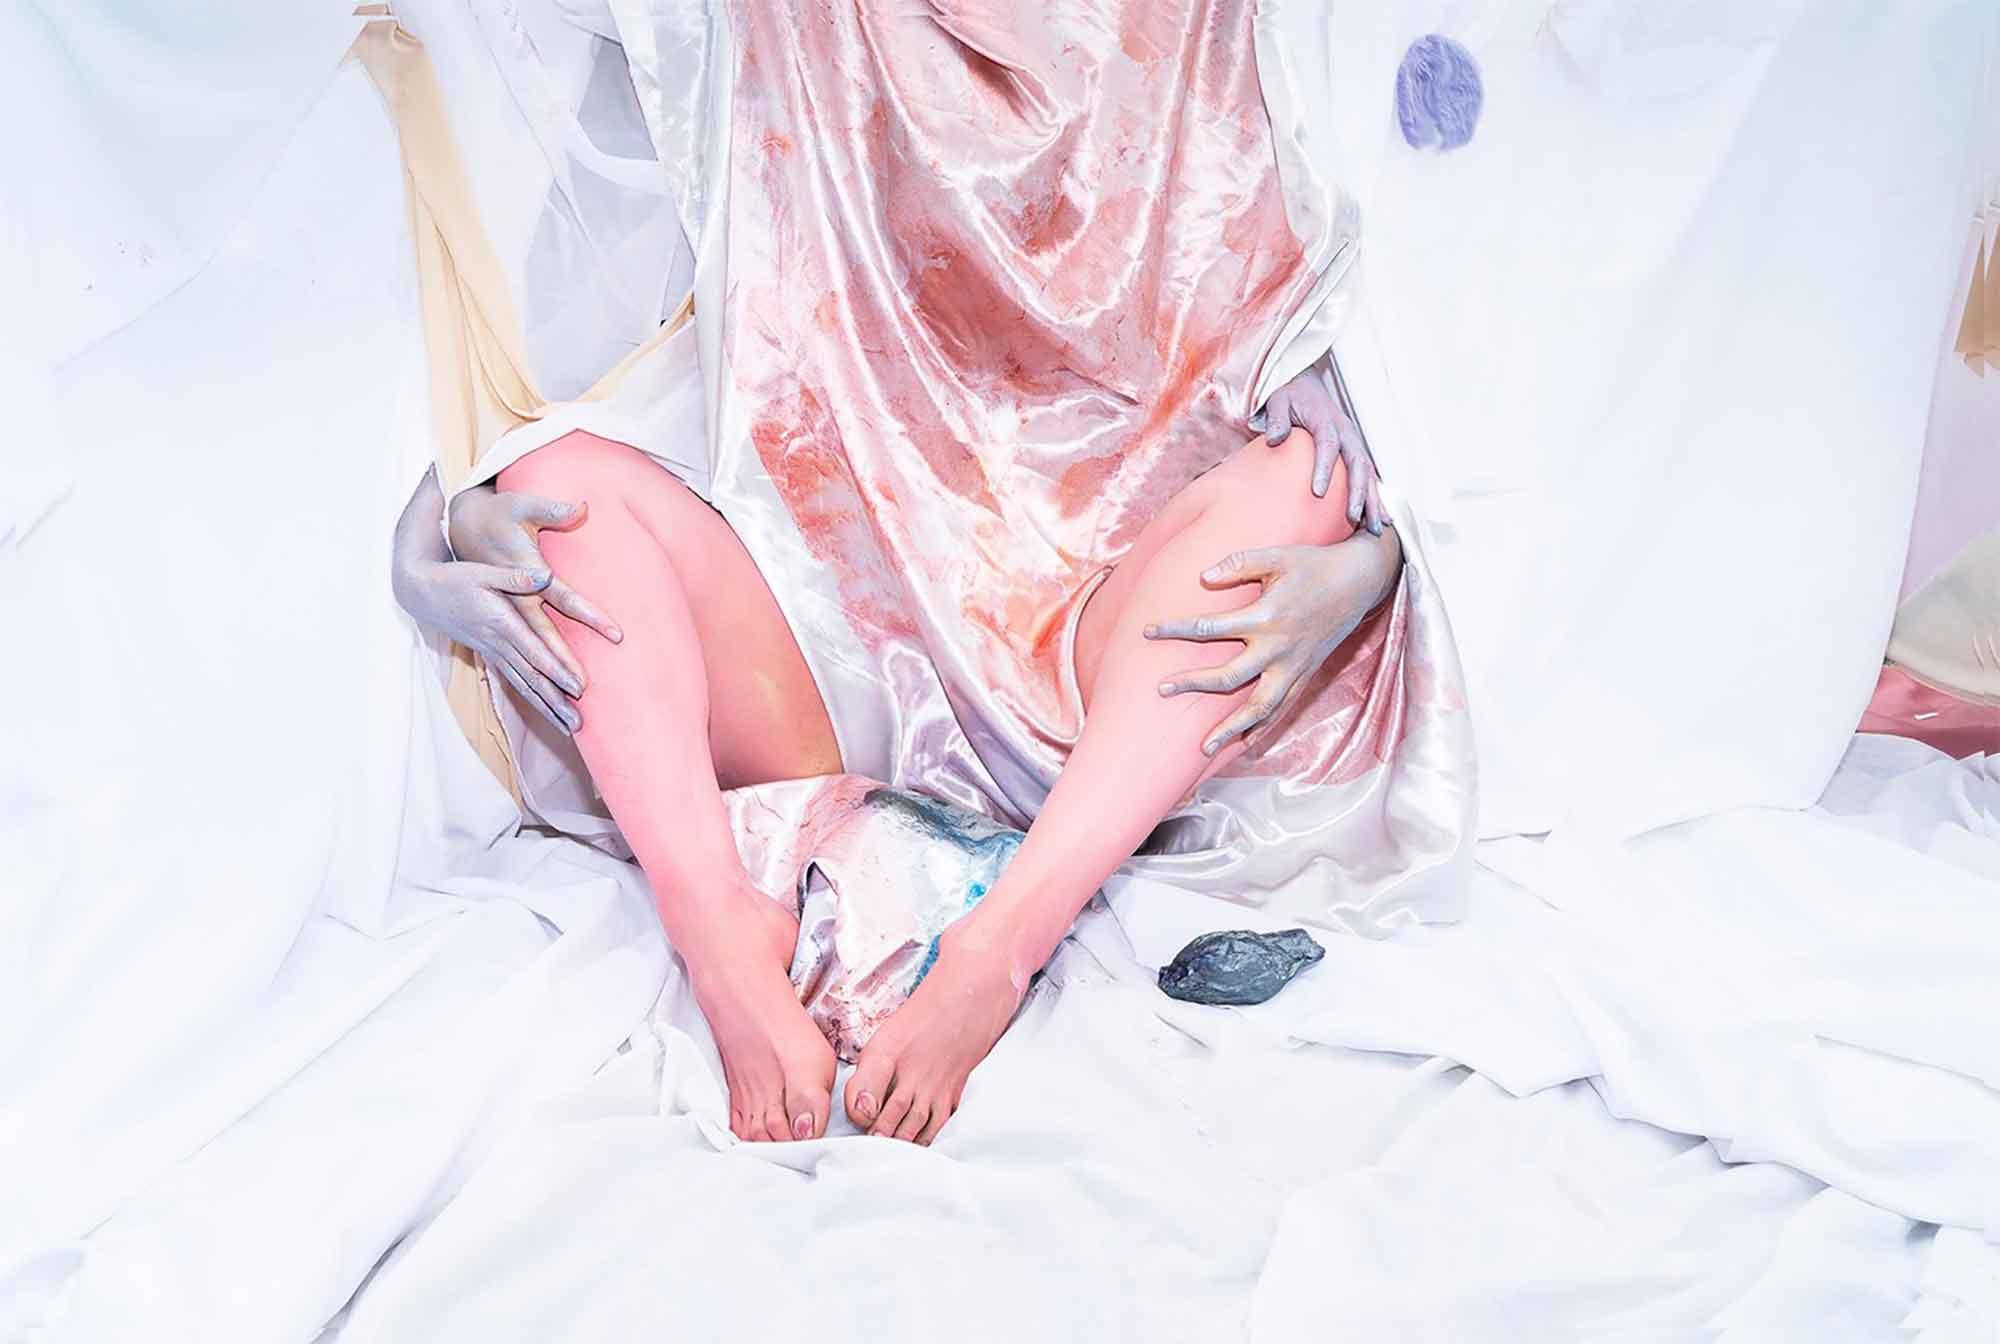 Brianna Speight, Pearl (after Jefferis), 2019, 63 x 95cm, giclee print. Photograph: Brianna Speight.